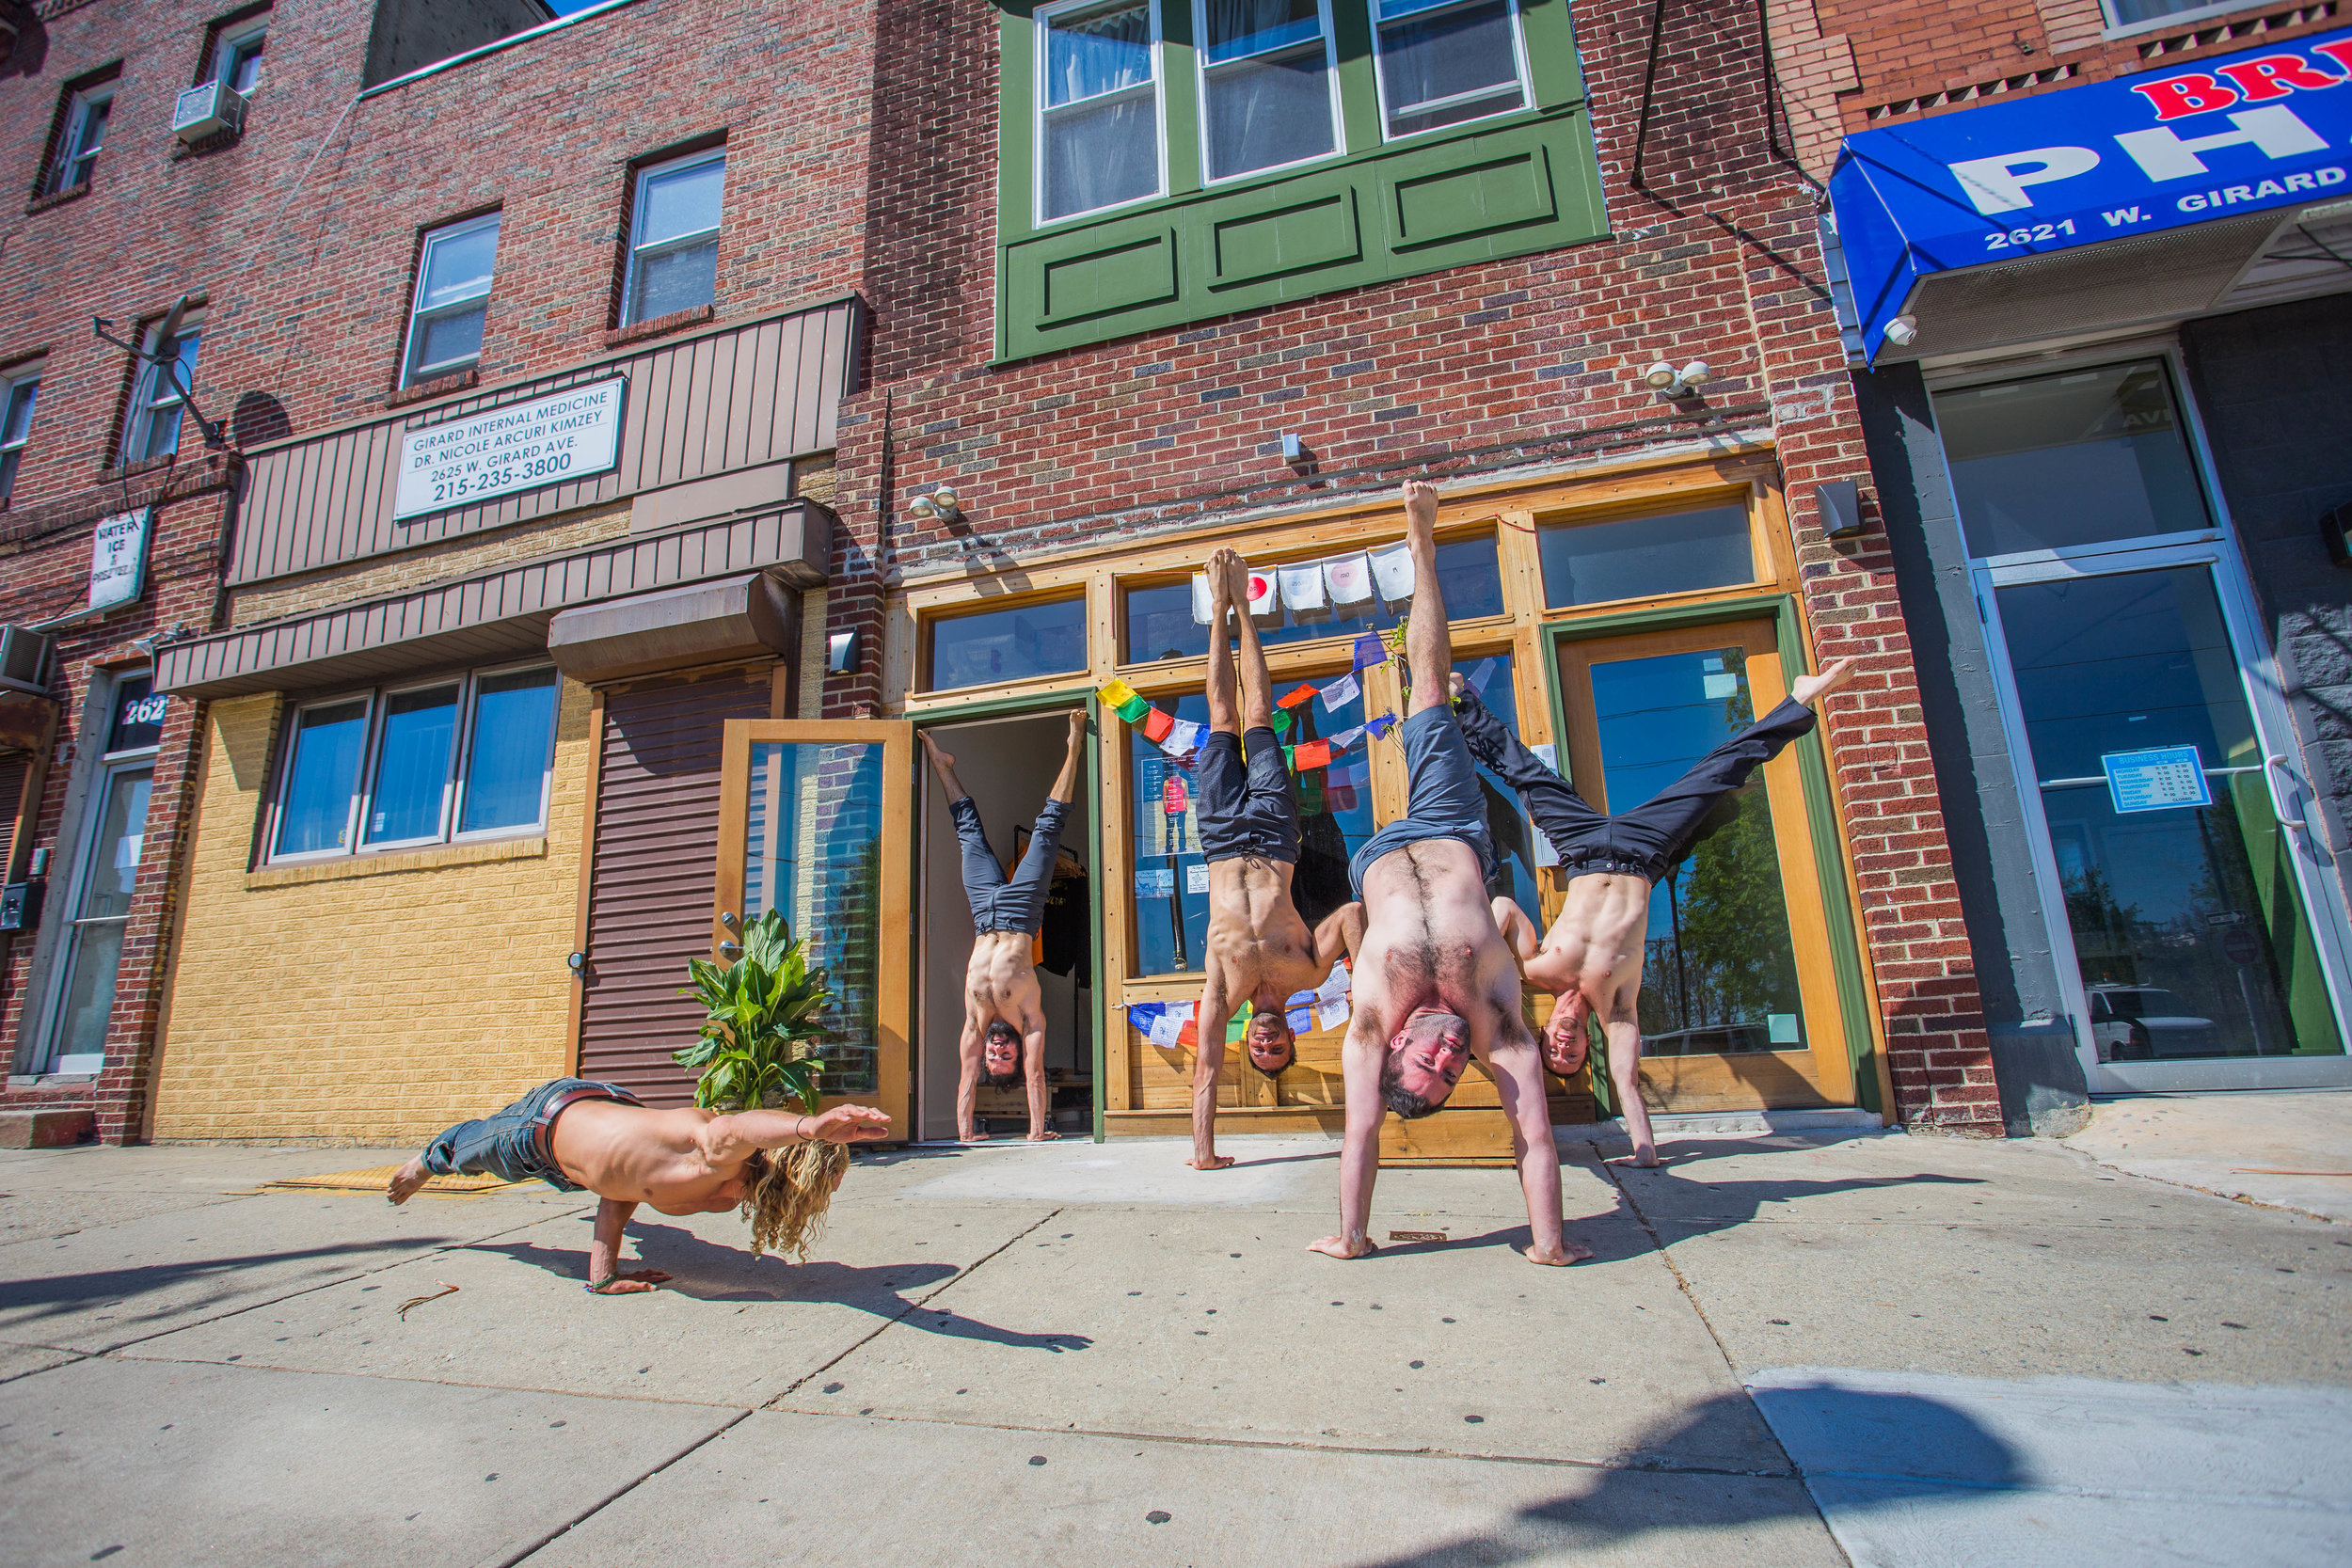 The Yoga and Movement Sanctuary tribe, Noah Julian, Emile Sorger, Ari Halbert, Johnathan Raiss, and Jacob Patrick Ellis